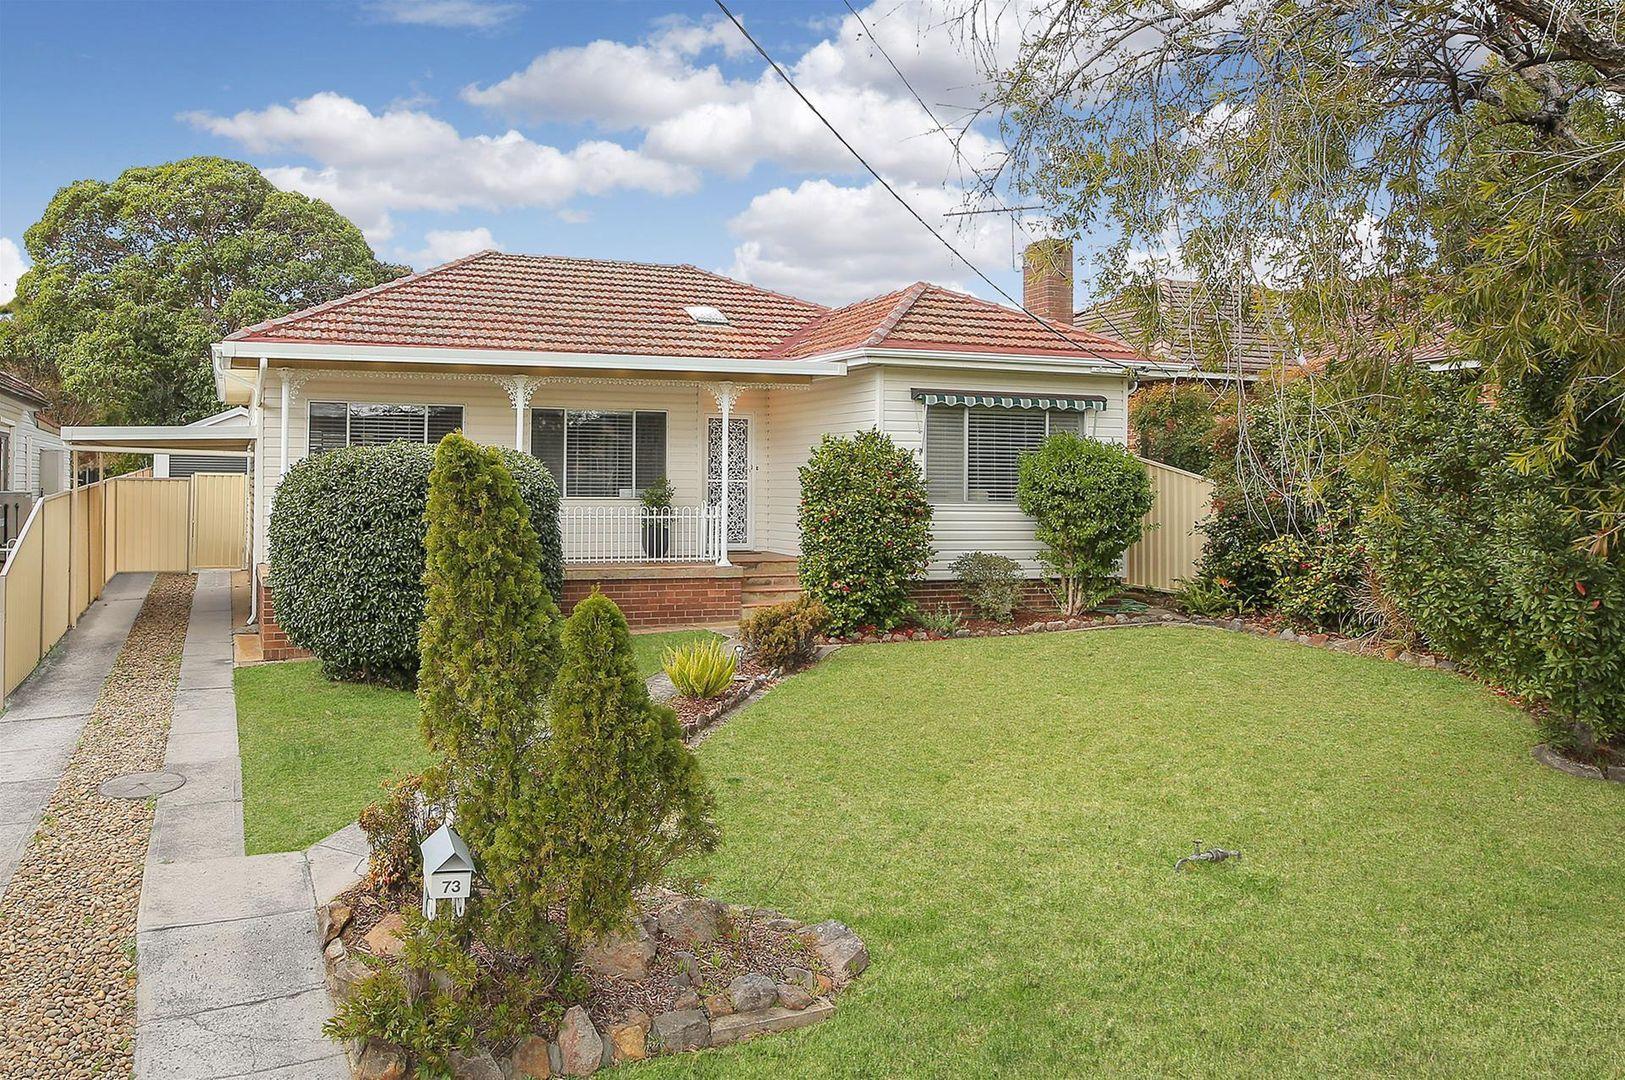 73 Milford Avenue, Panania NSW 2213, Image 0